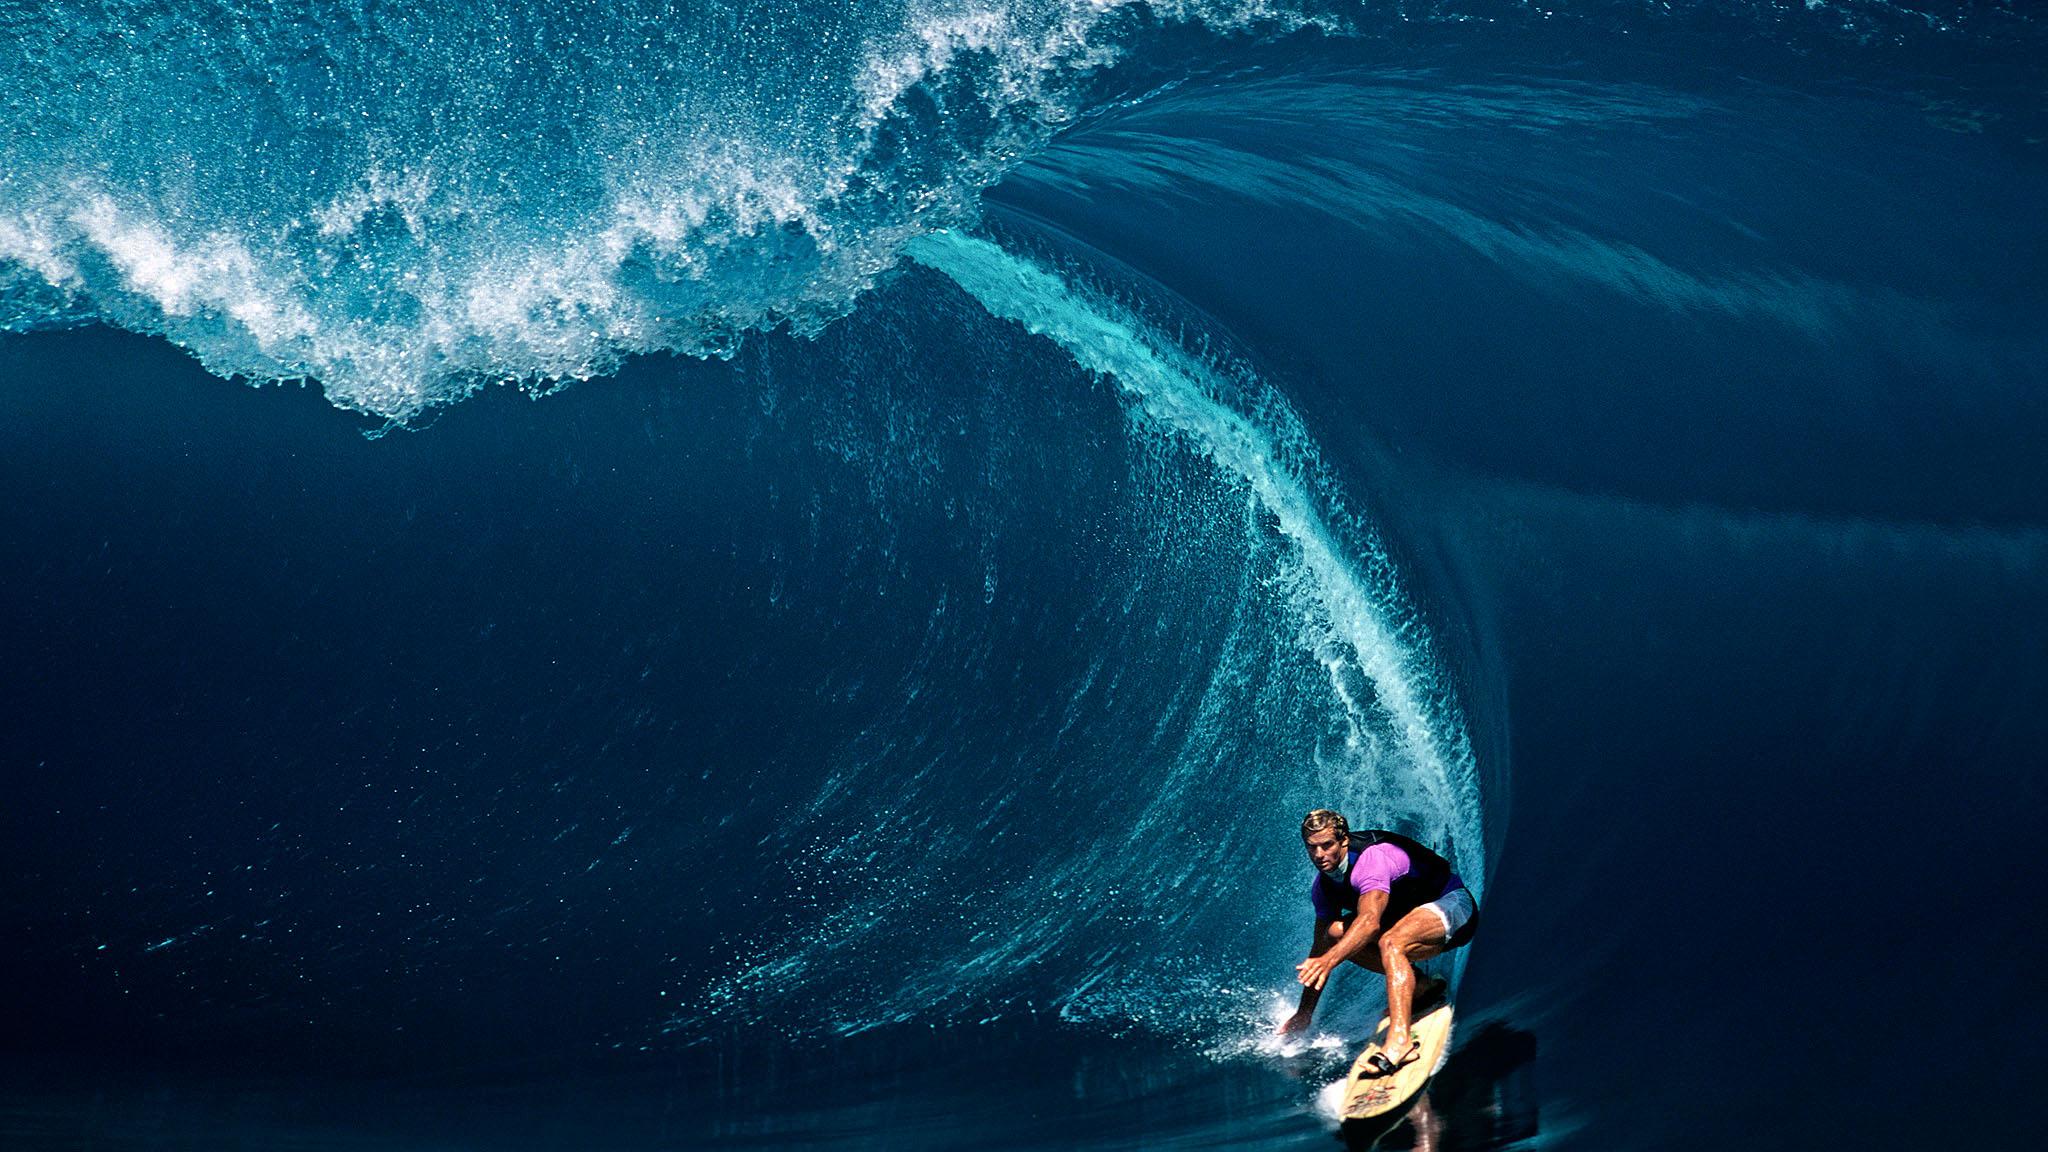 A Big Wave Surfing History | 2048 x 1152 jpeg 513kB